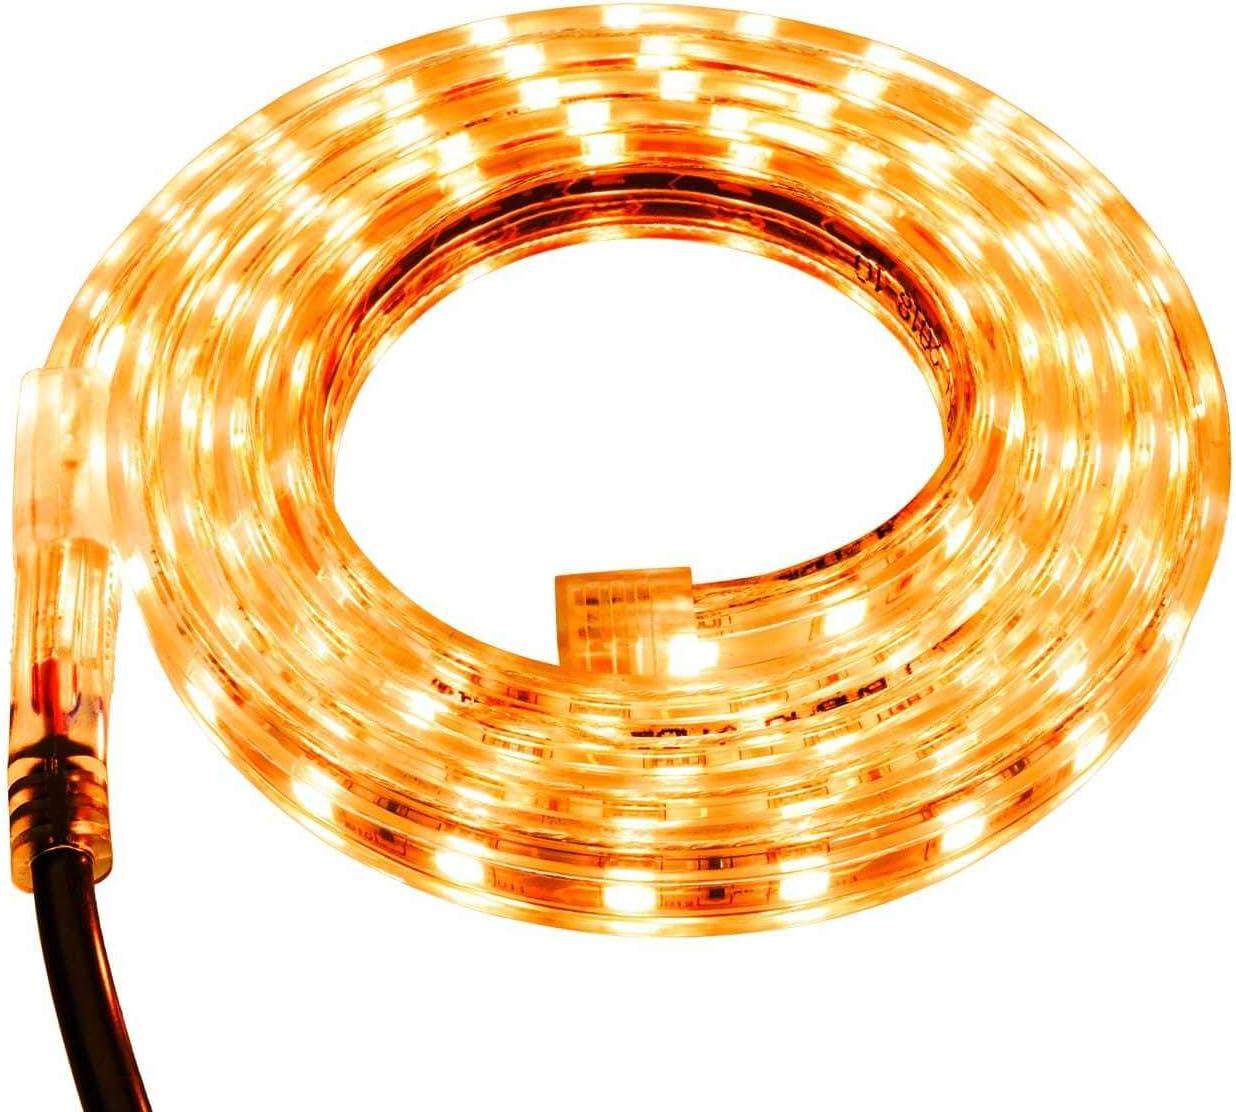 Brilliant Brand Lighting Yellow LED Strip - Light Volt Hig 5 ☆ Max 52% OFF popular 120